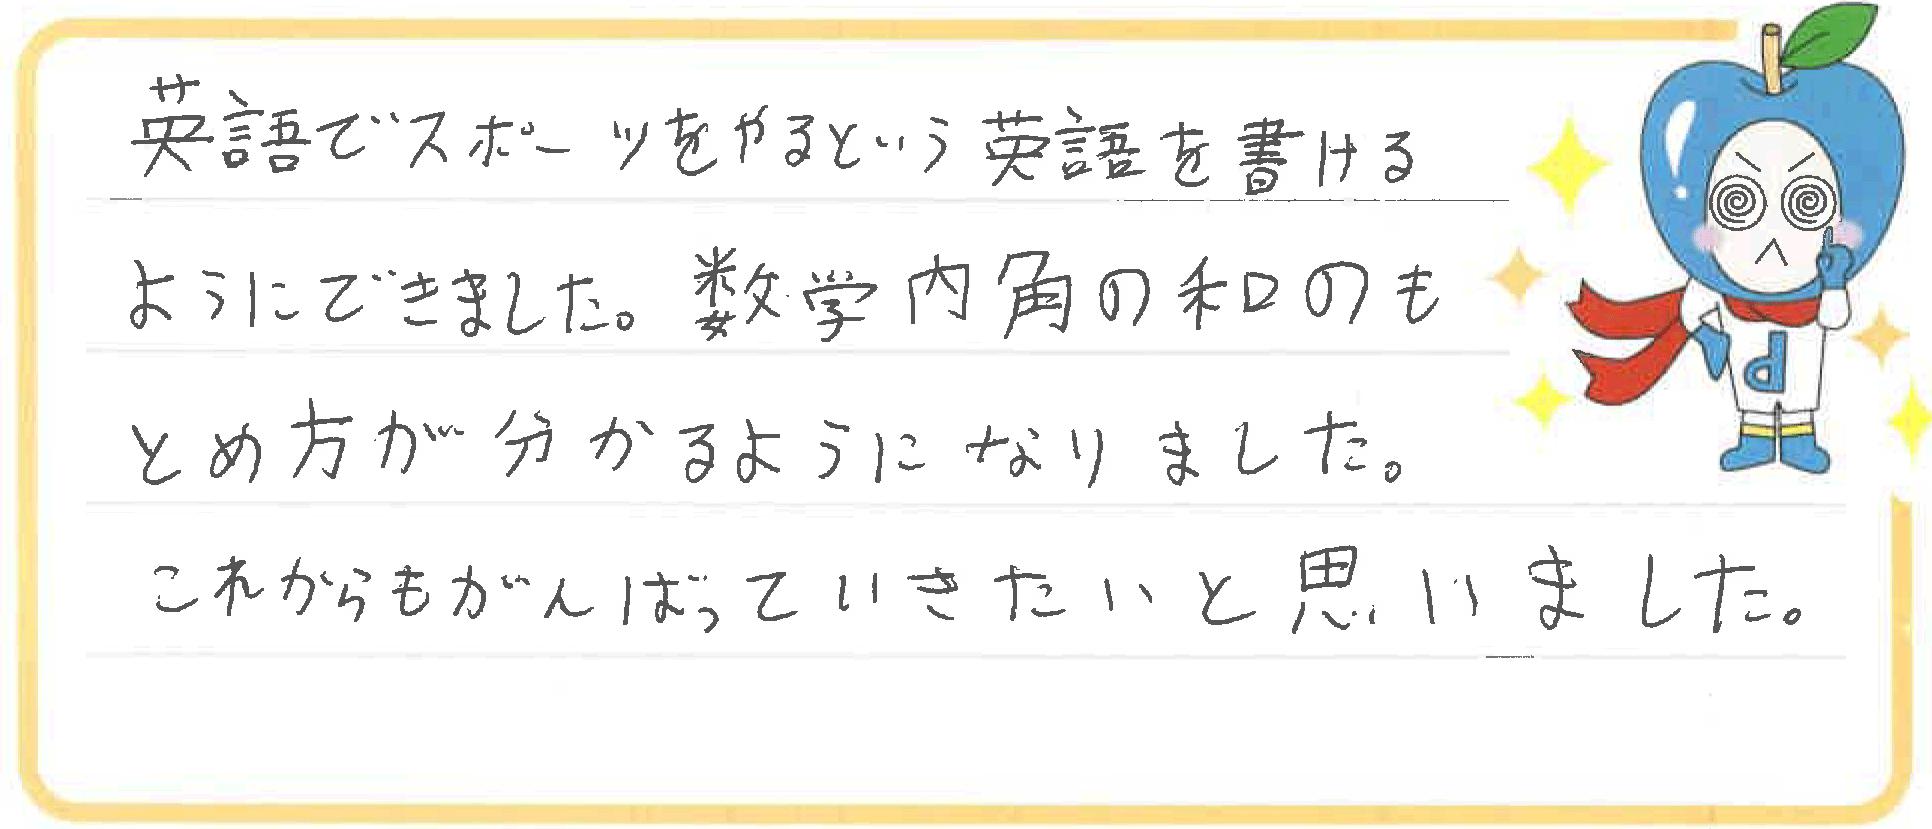 Rちゃん(勝山市)からの口コミ